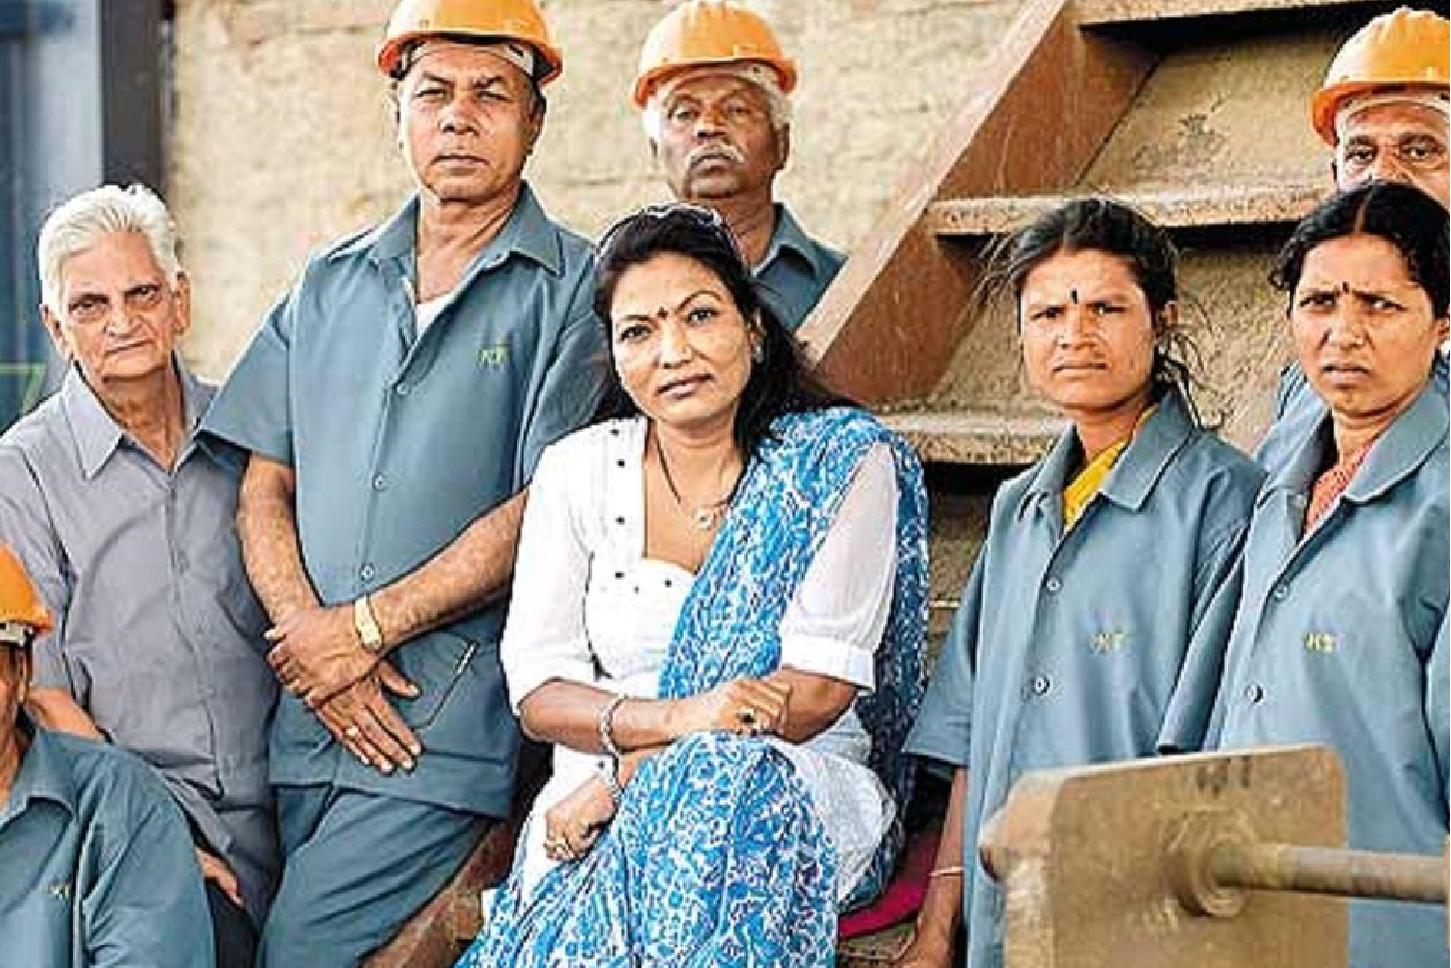 Inspiring entrepreneurs of India